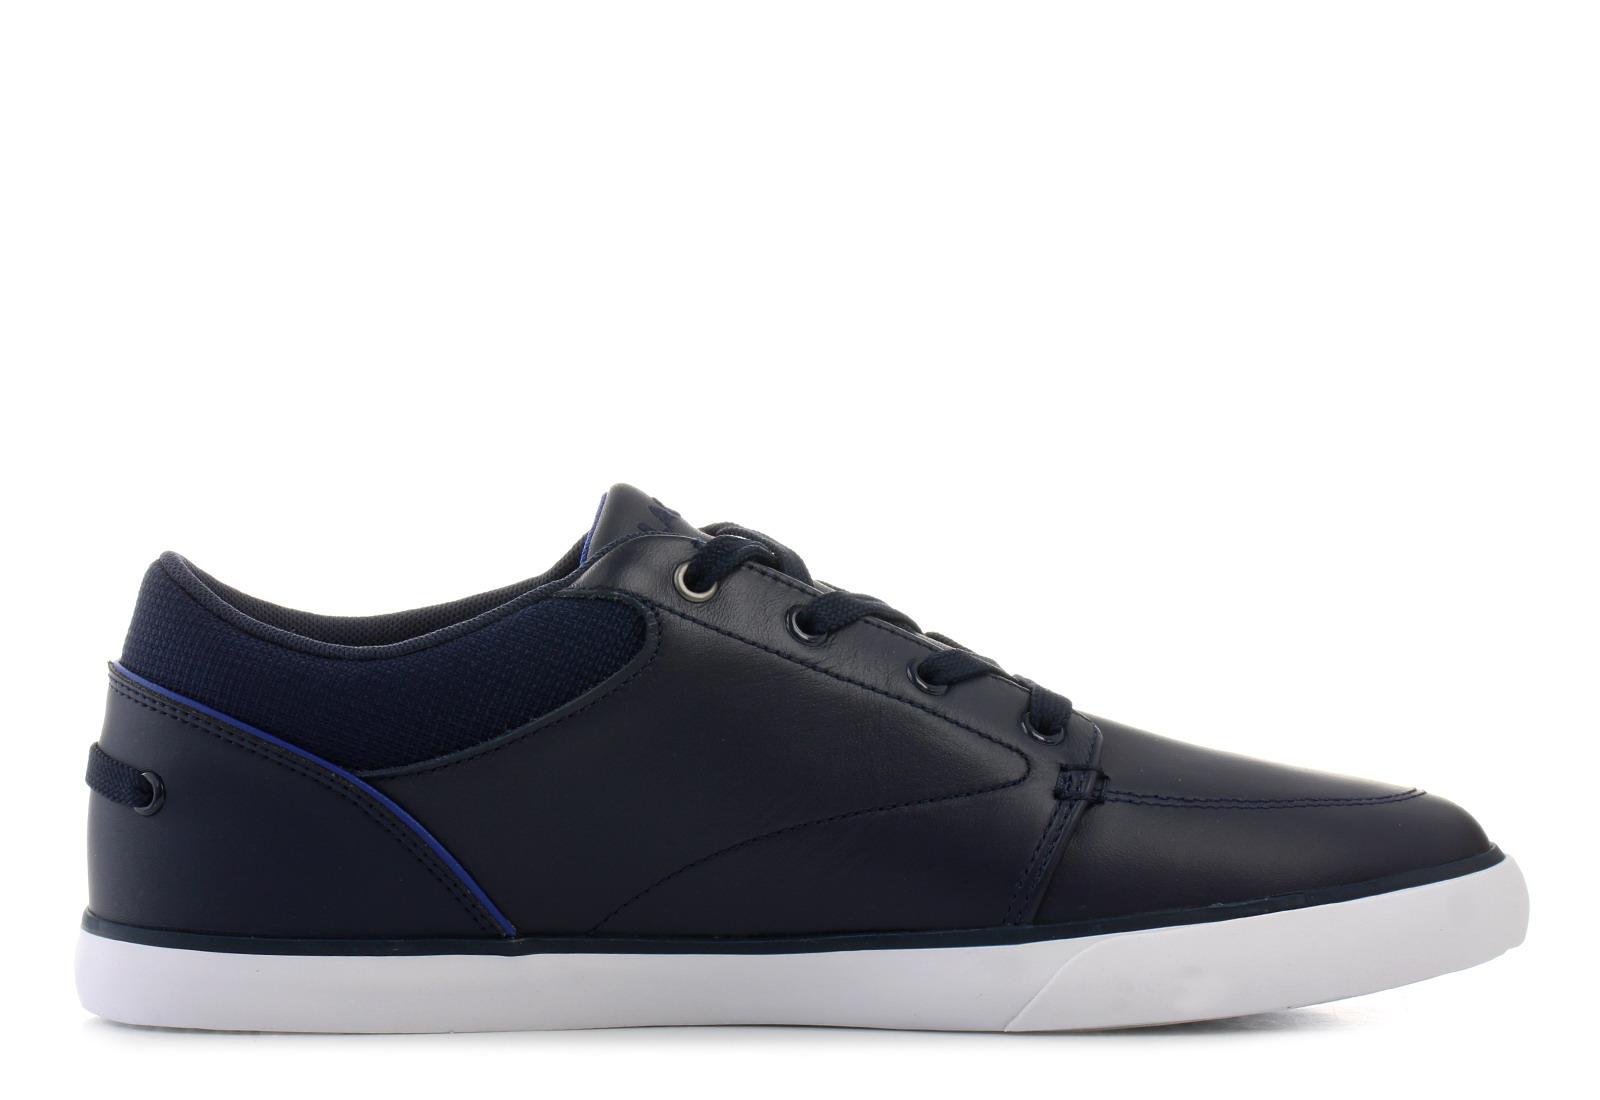 Lacoste Cipő - Bayliss - 183CAM0007-ND1 - Office Shoes Magyarország fe78beecfc